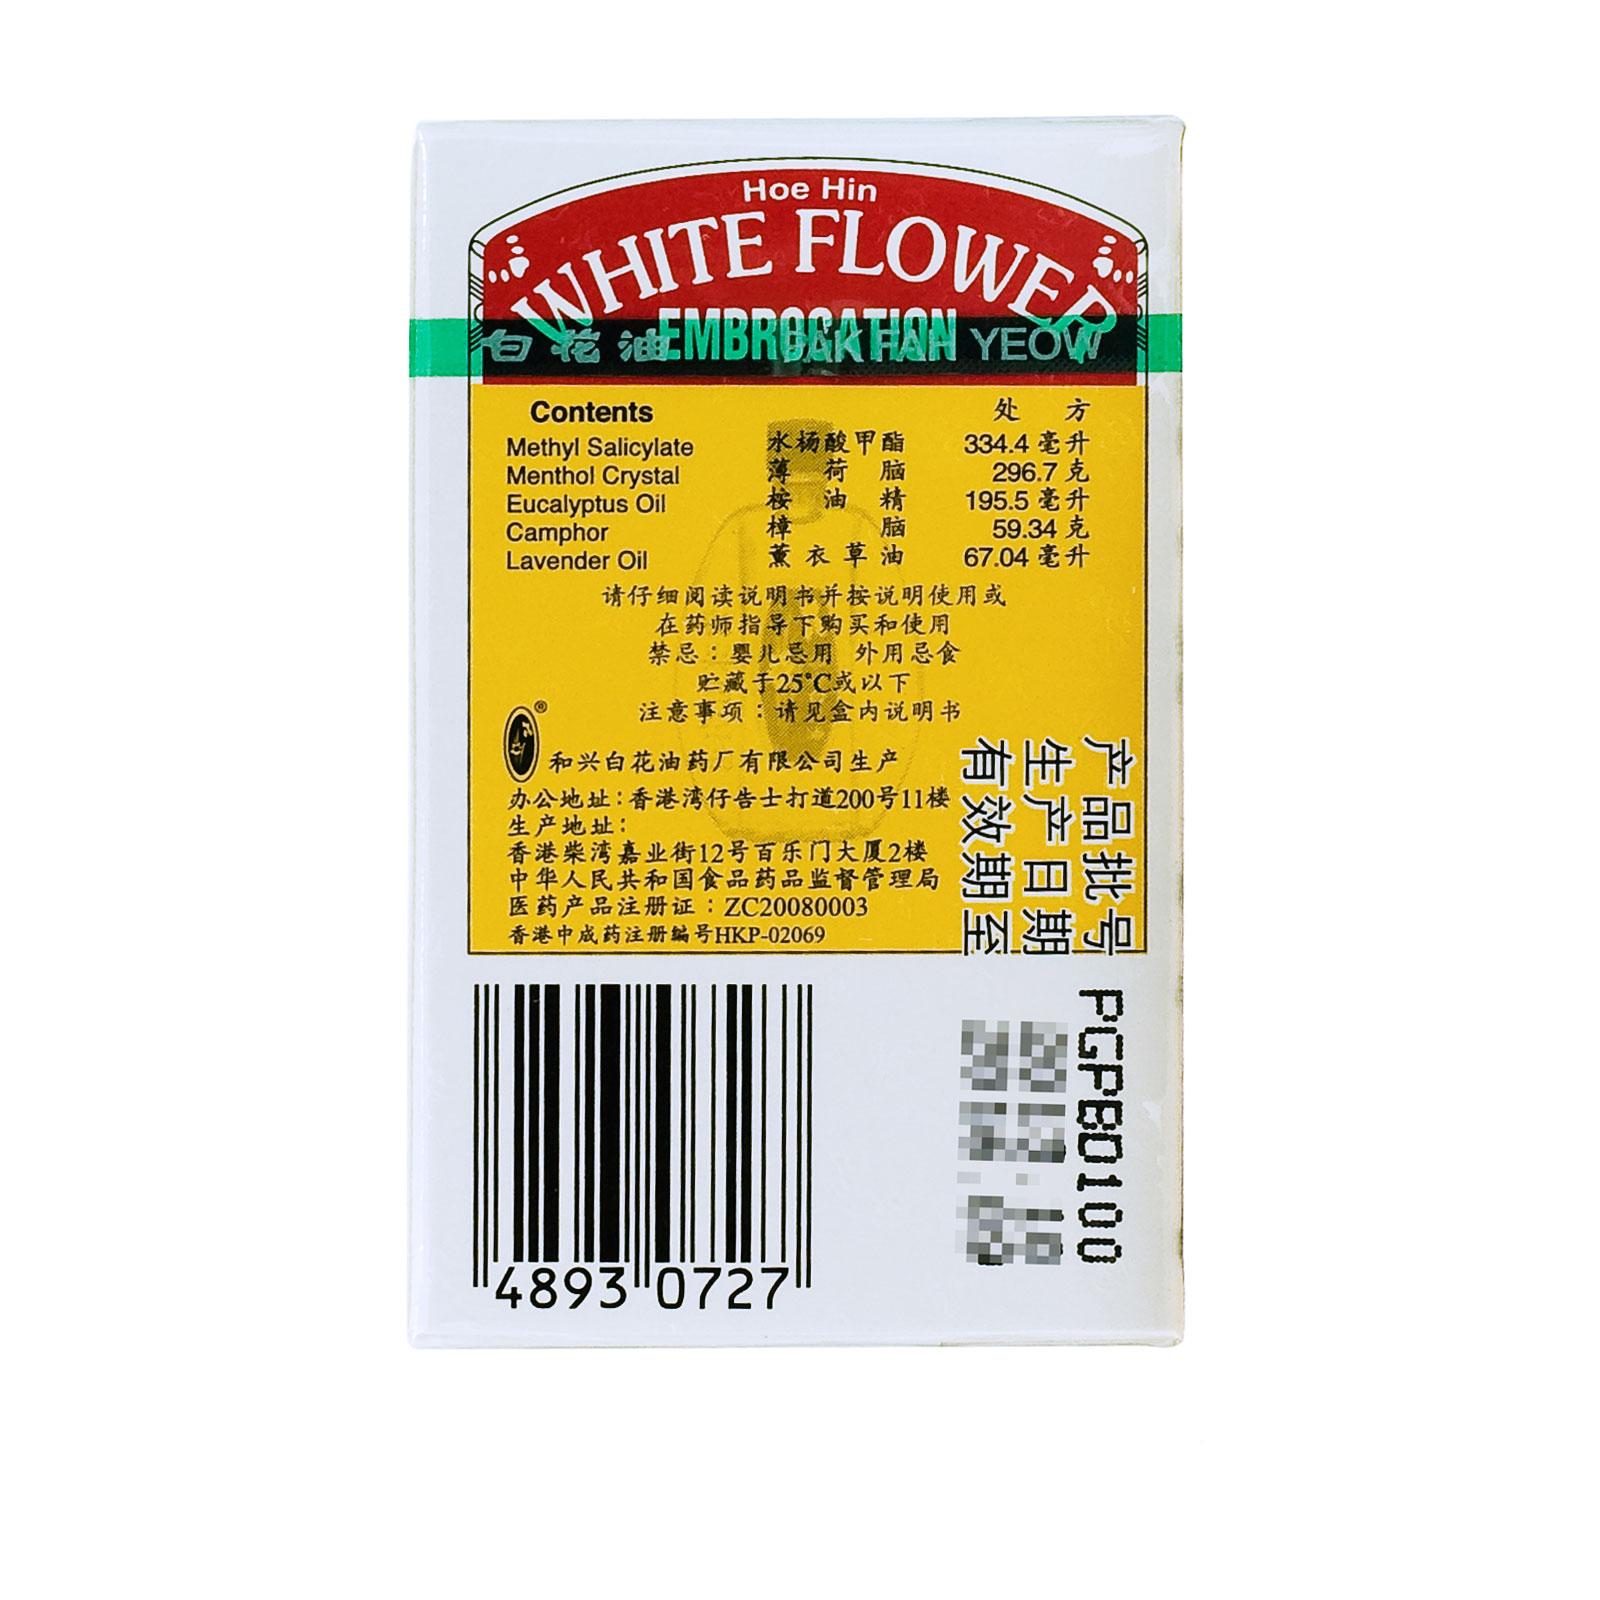 White Flower Medicated Oil Choice Image Fresh Lotus Flowers